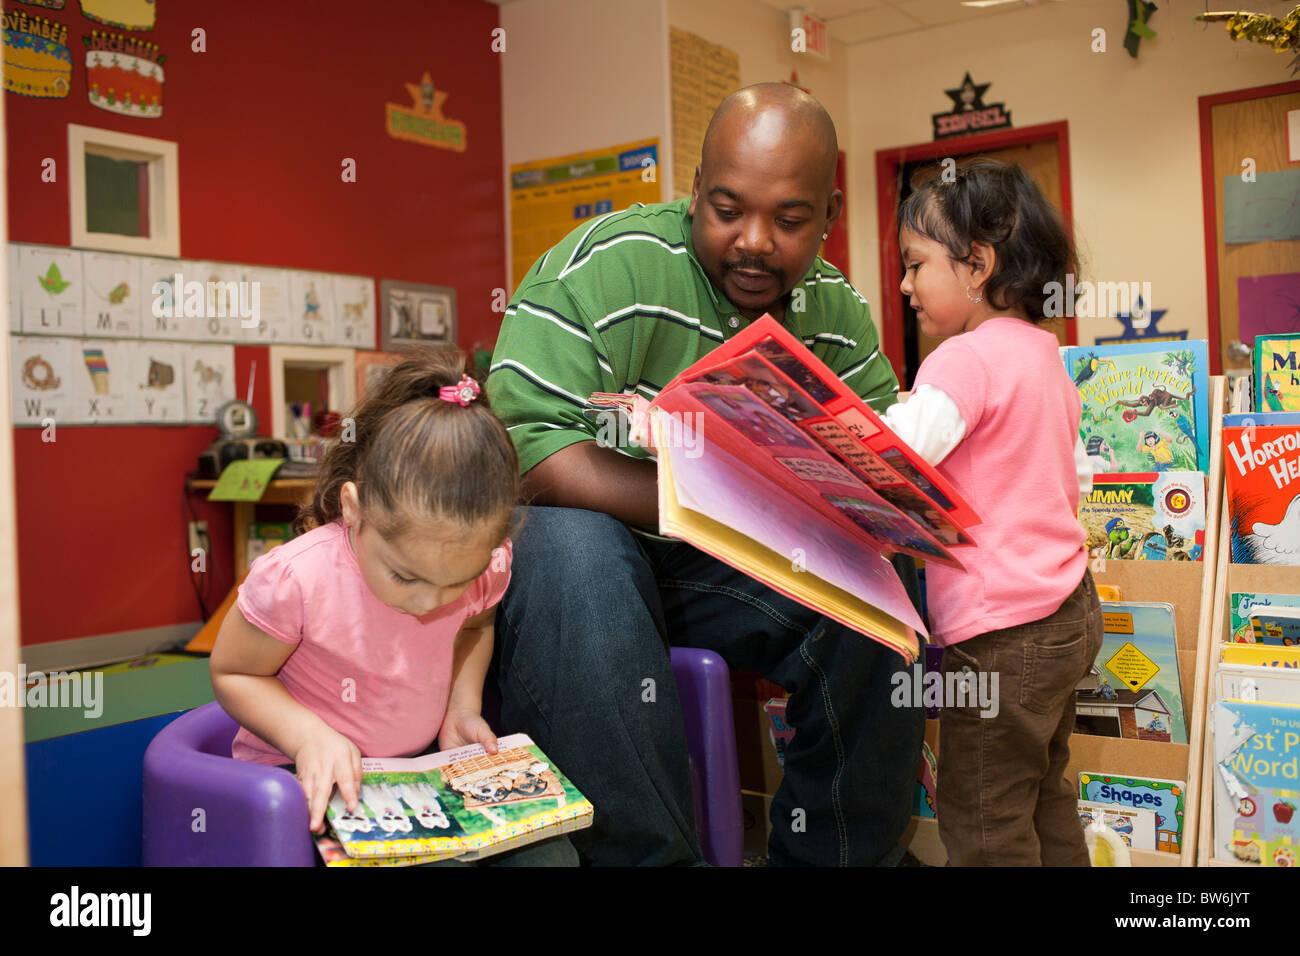 Live'n Learn Smile Center in Birdsboro, PA - Child Care ...